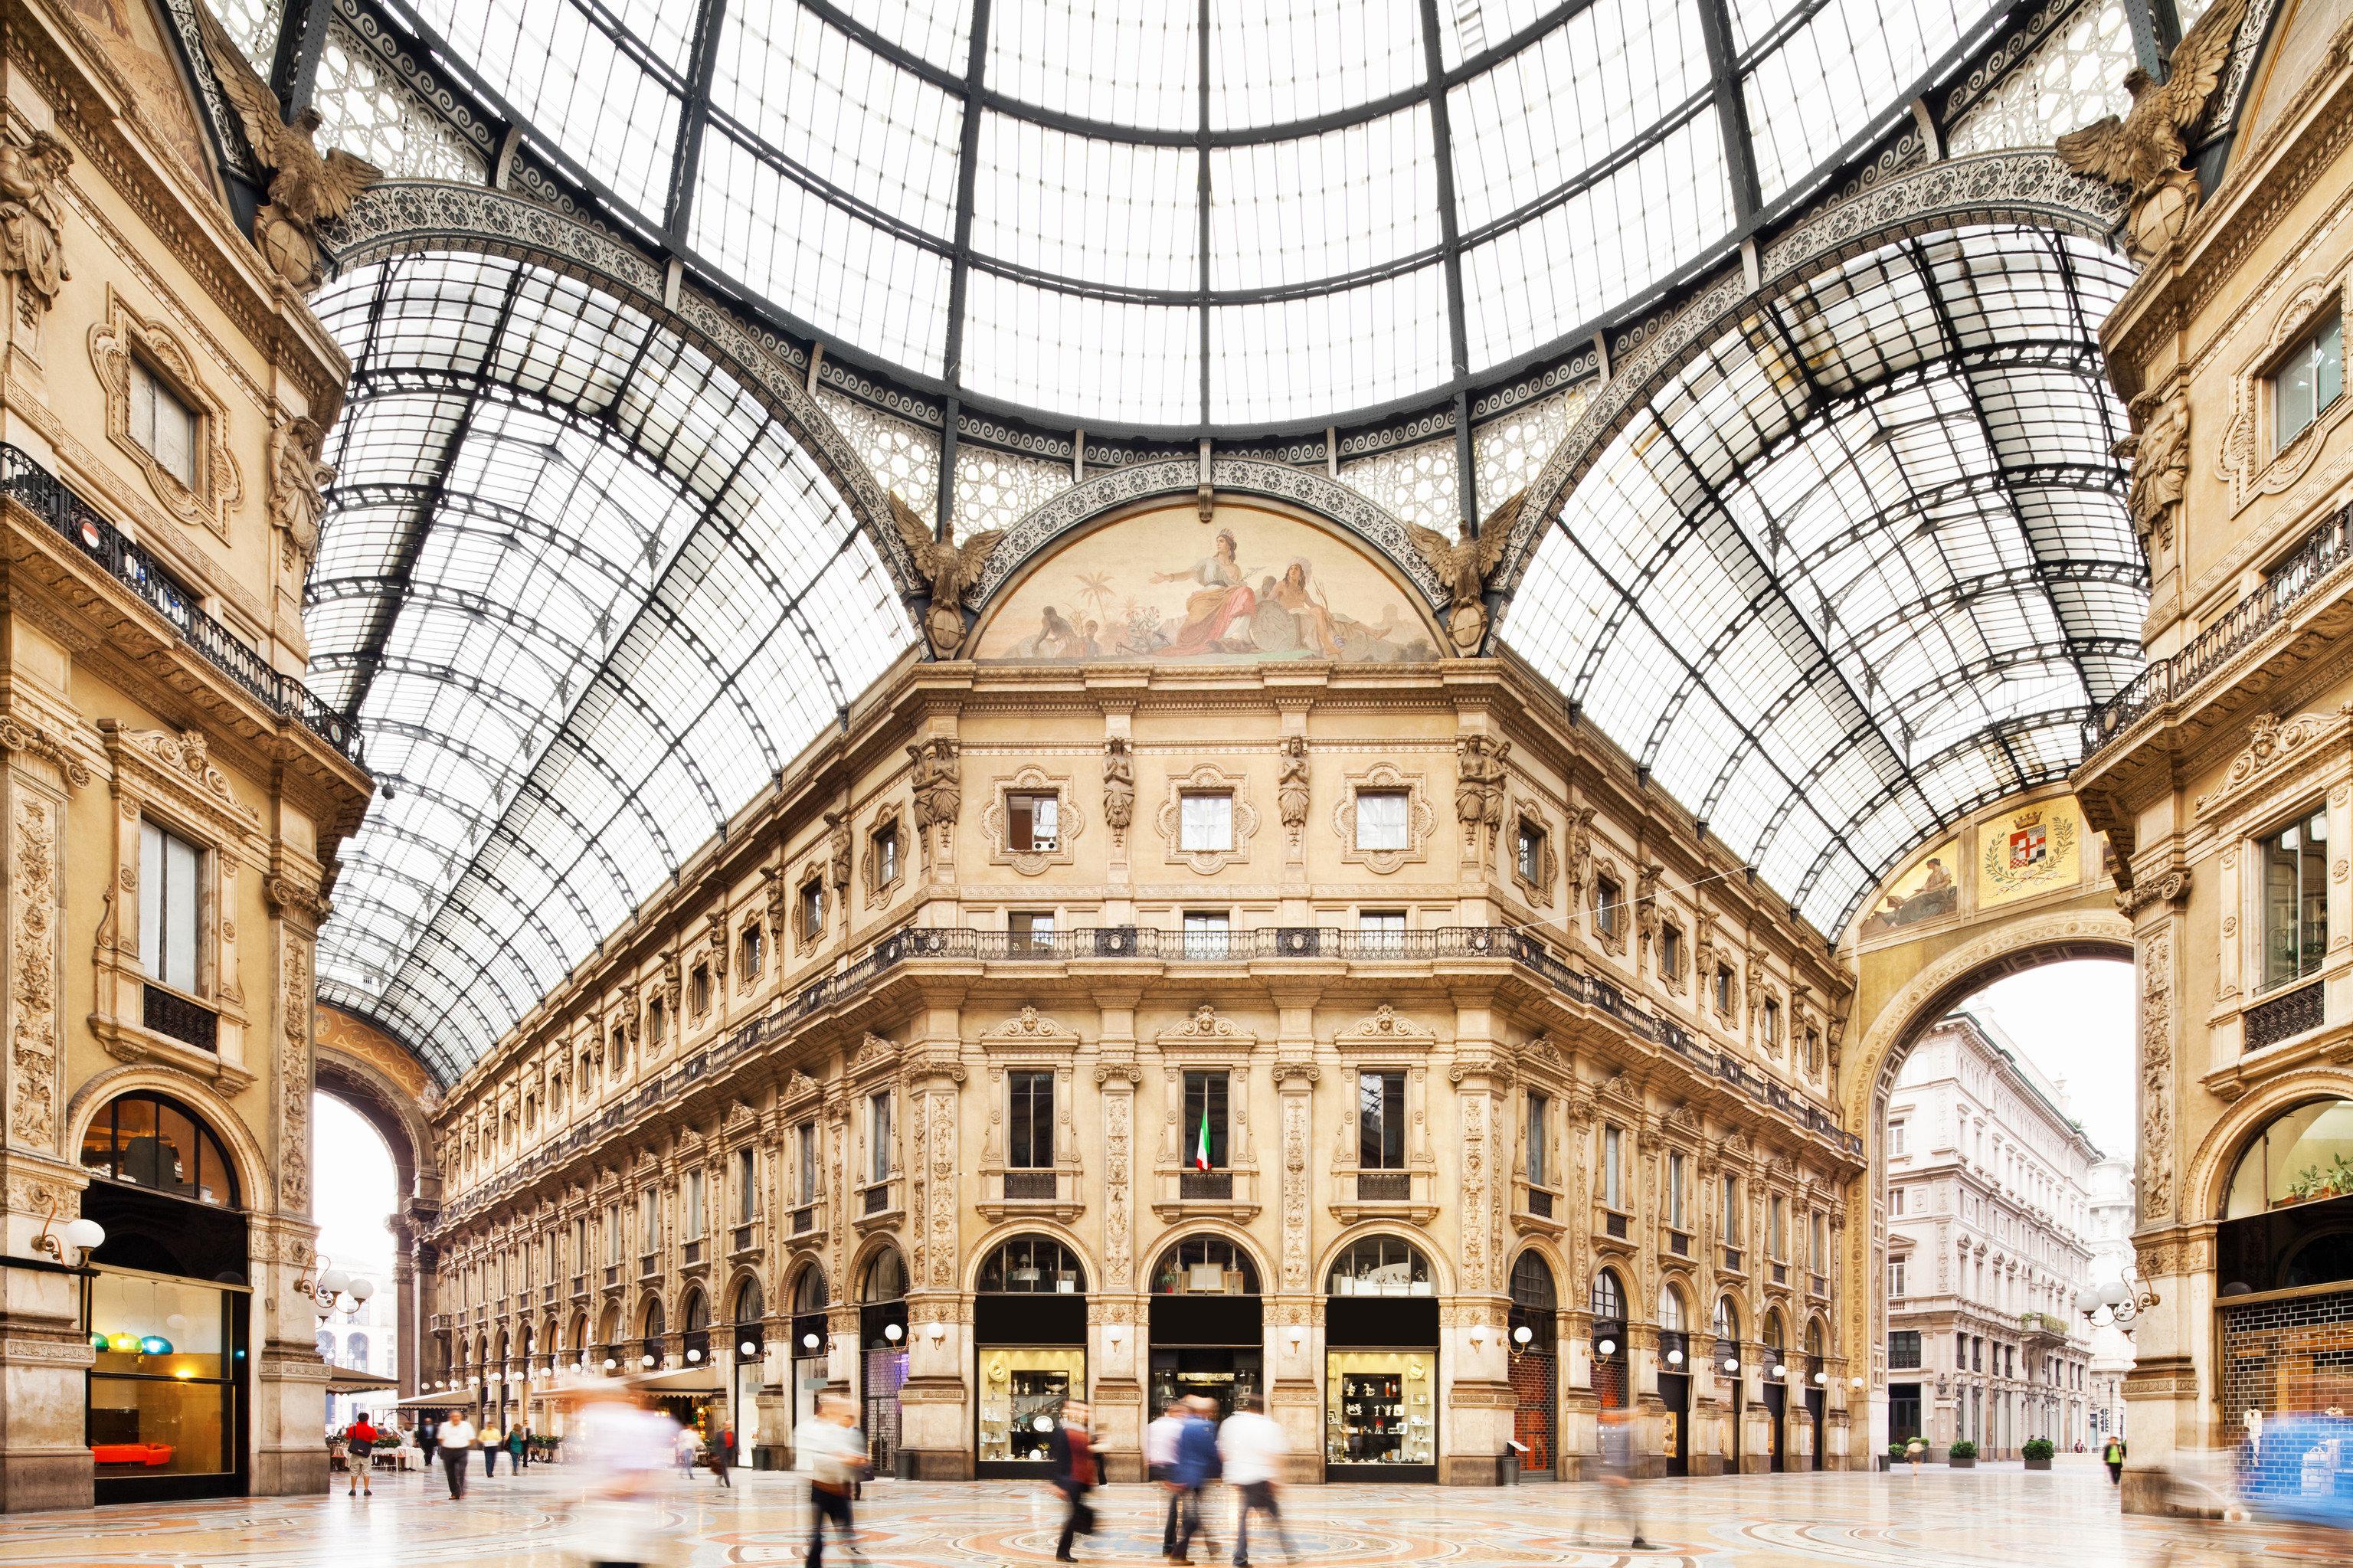 Trip Ideas building plaza landmark arcade classical architecture Architecture facade palace symmetry basilica